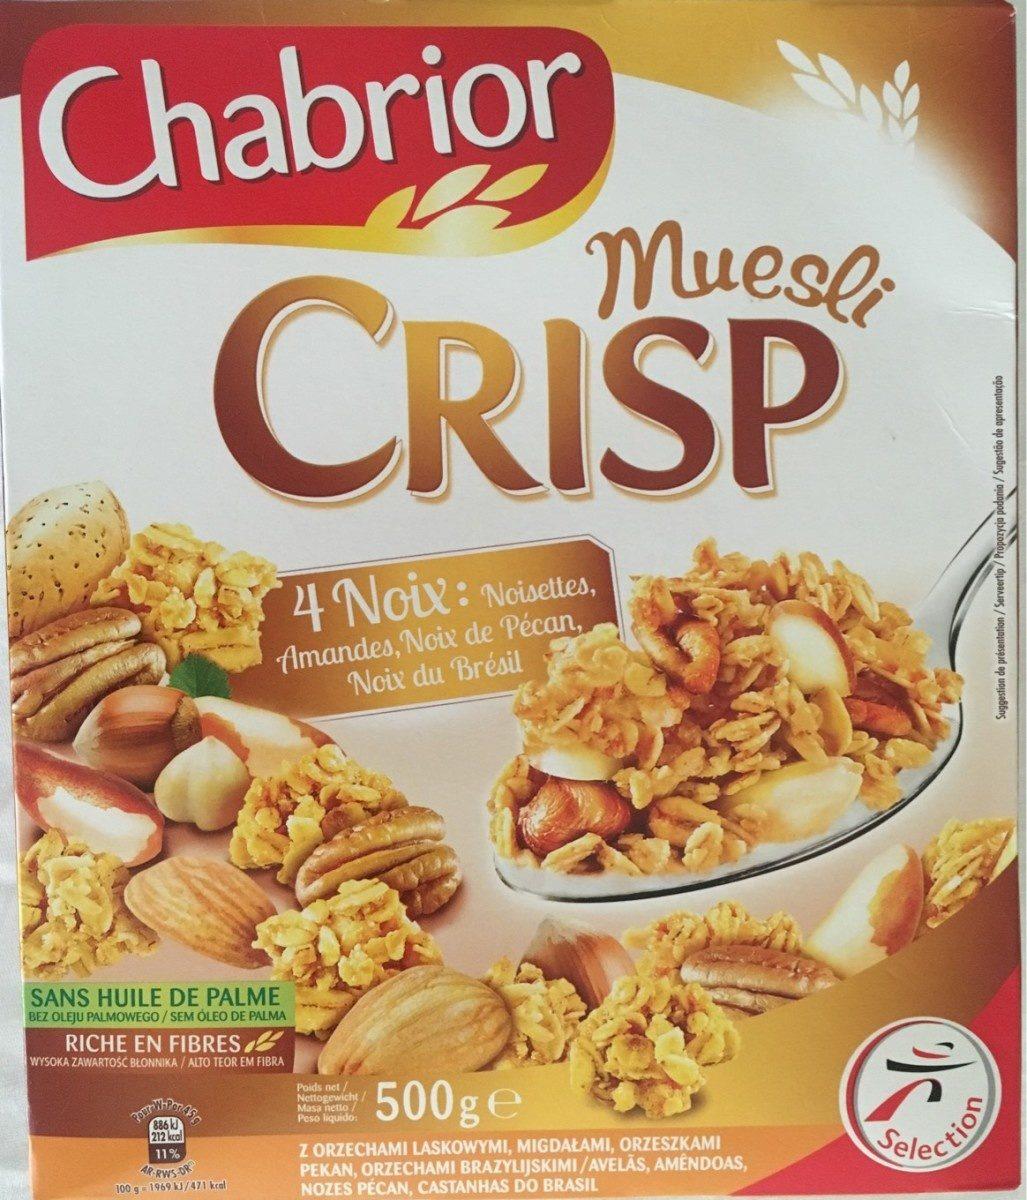 Muesli Crisp 4 Noix - Product